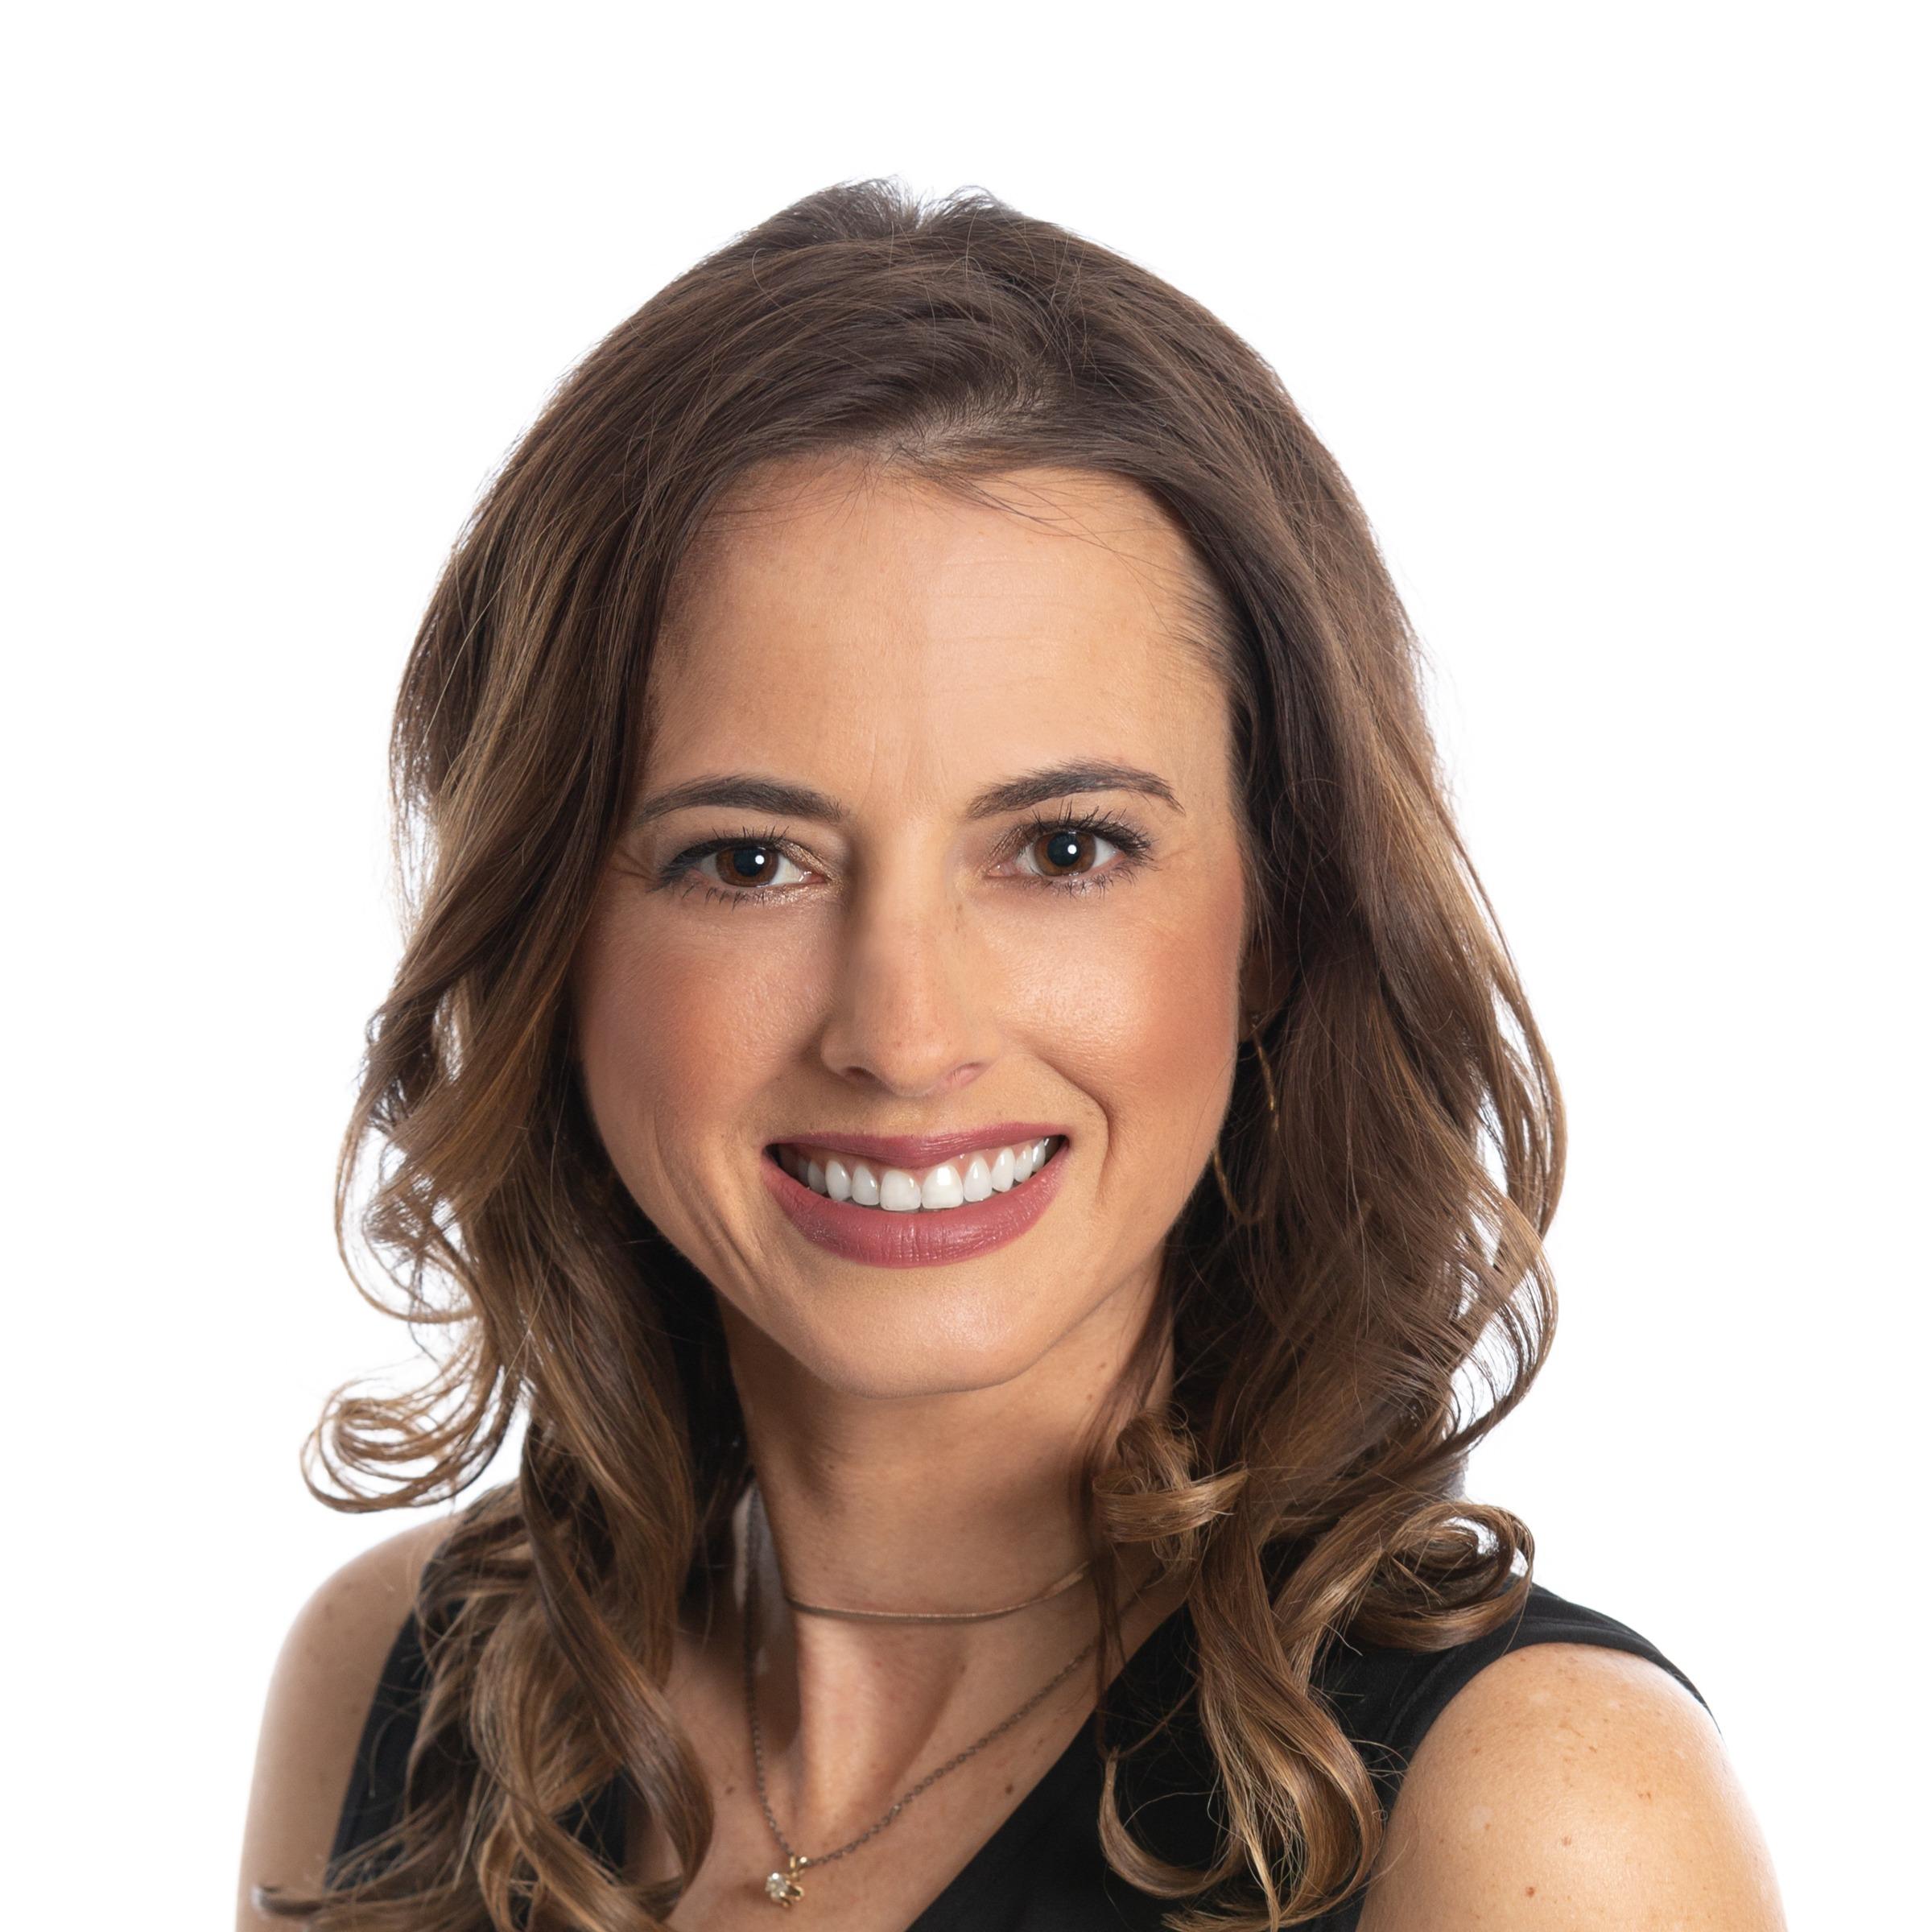 Tabitha Player of Blackburn & Elrod Orthodontics